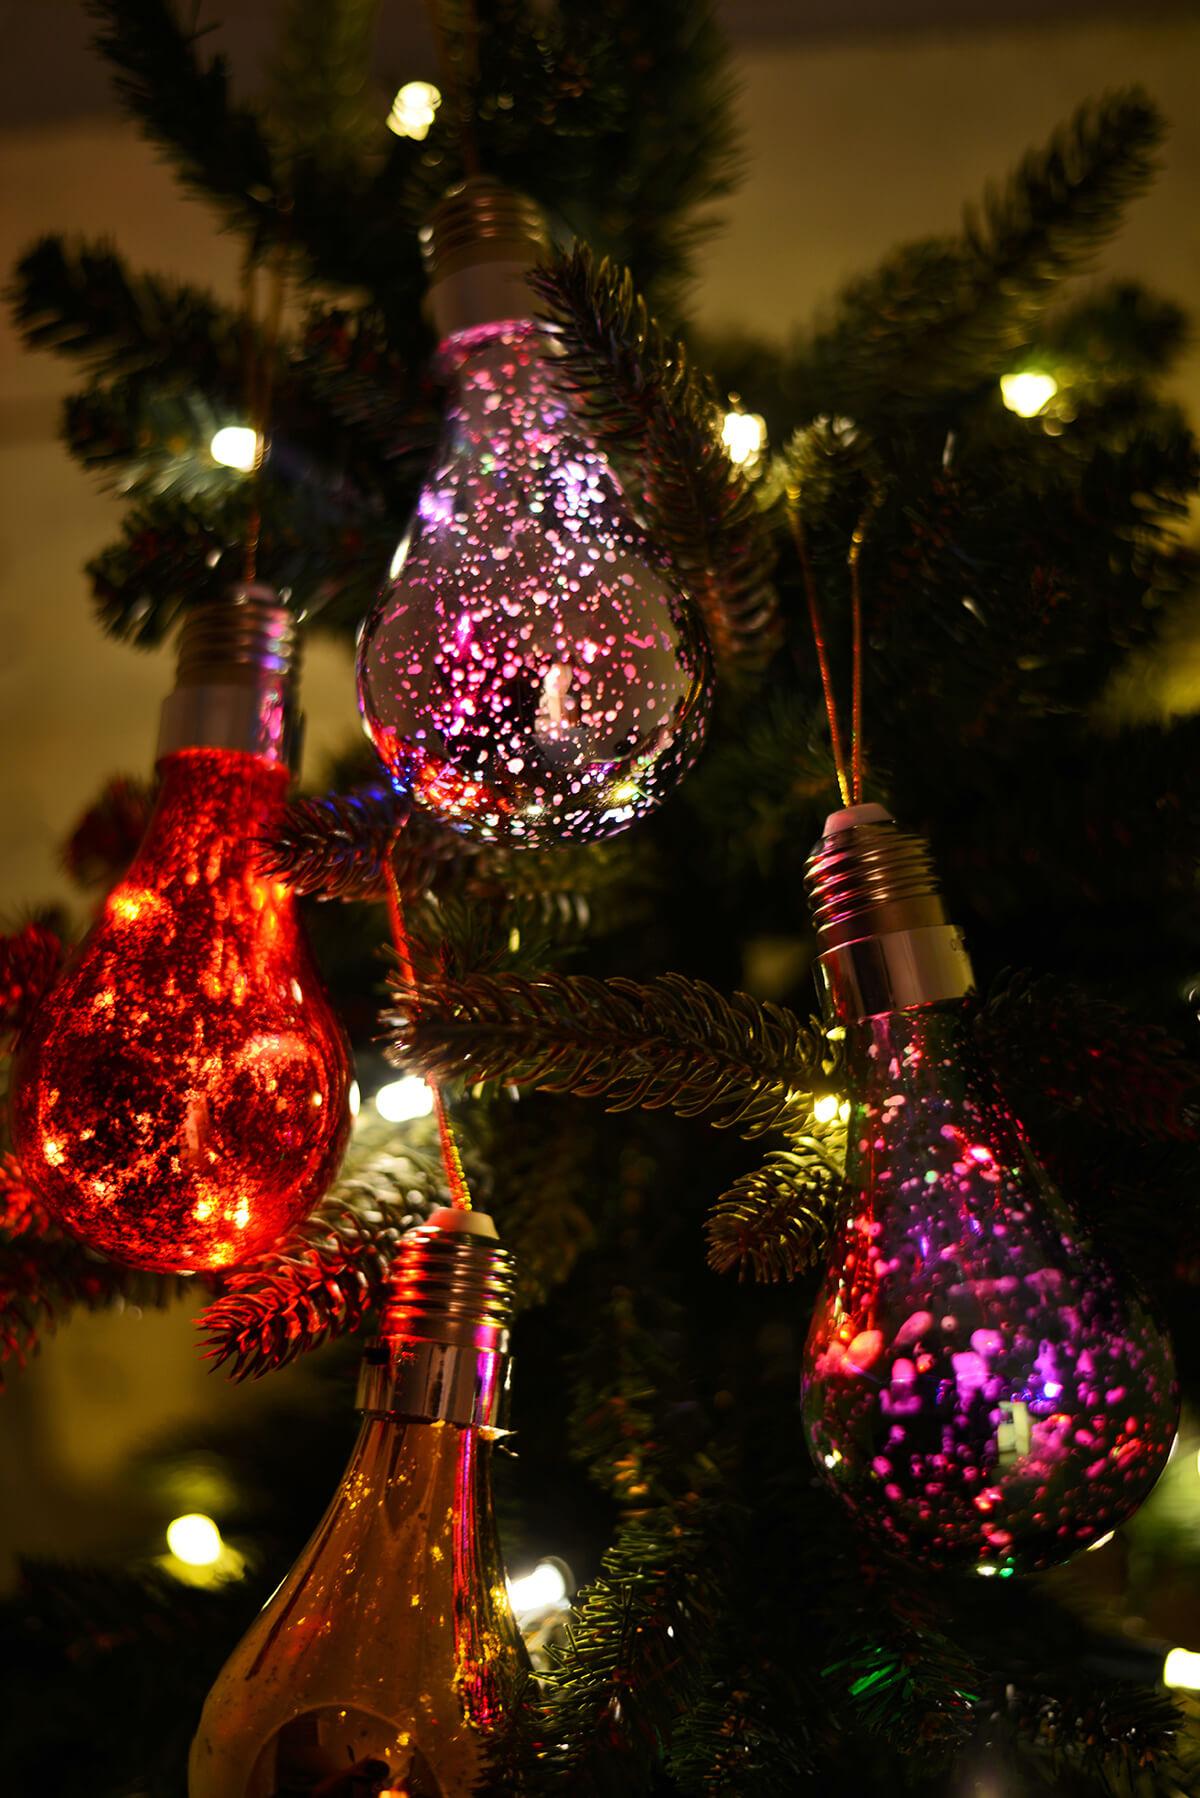 LED Mercury Glass Light Bulbs 55 Christmas Decorations Battery